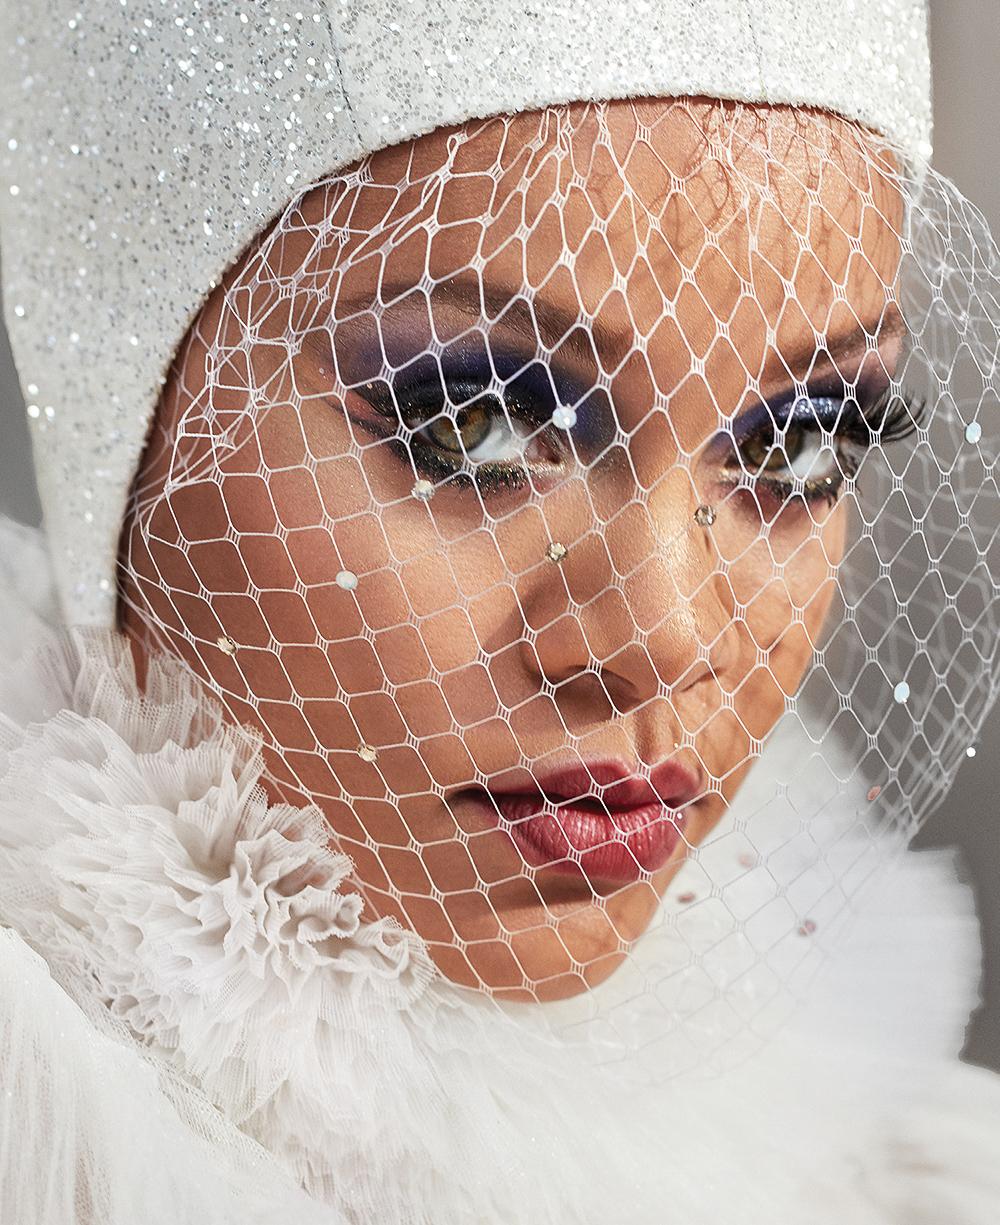 Harpers-Bazaar-Rihanna-3